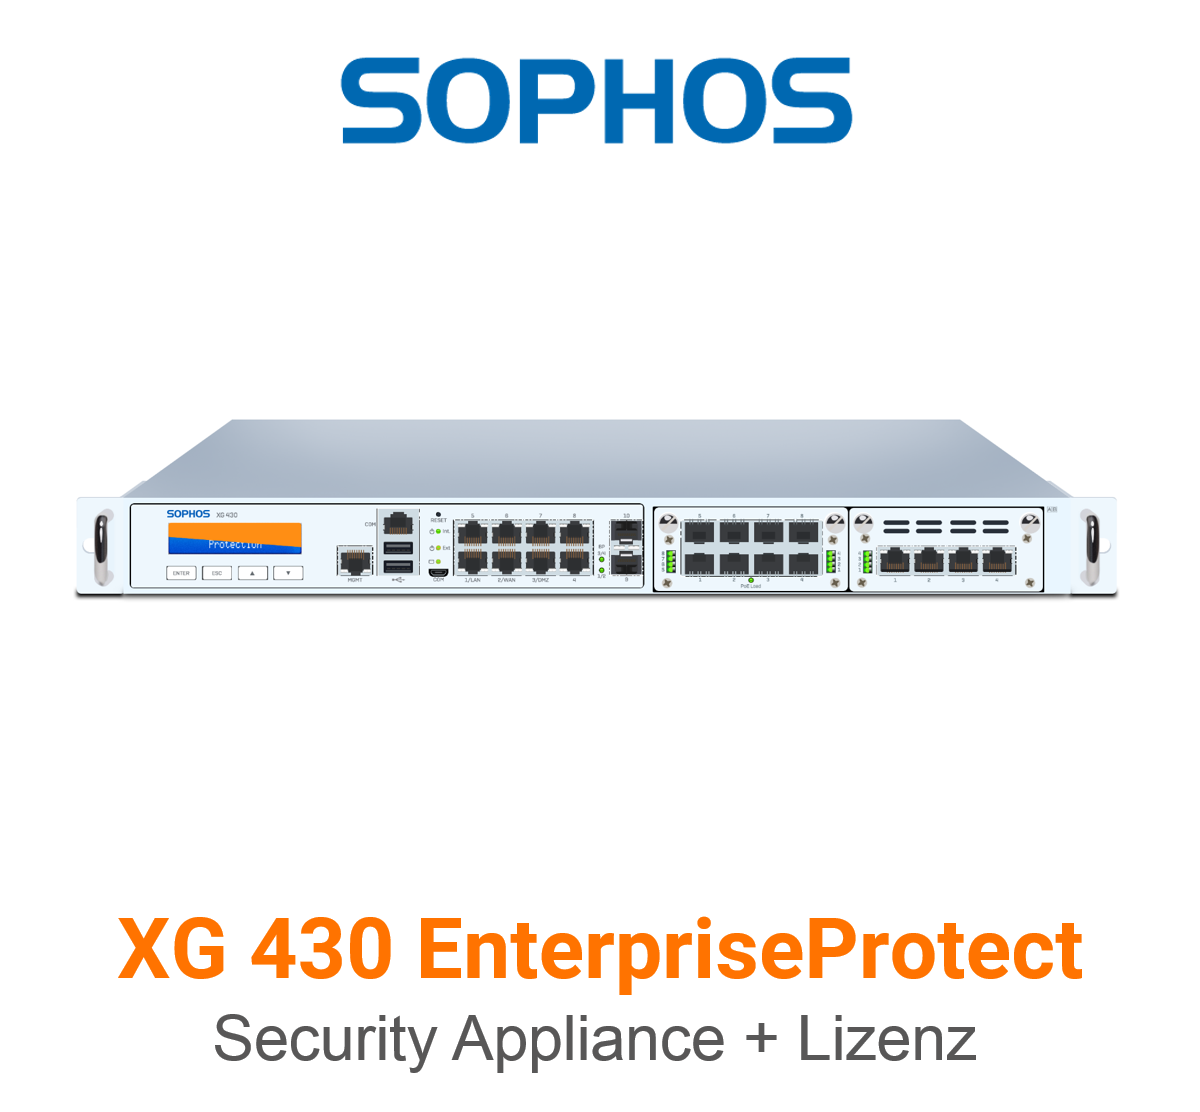 Sophos XG 430 EnterpriseProtect Bundle (Hardware + Lizenz)